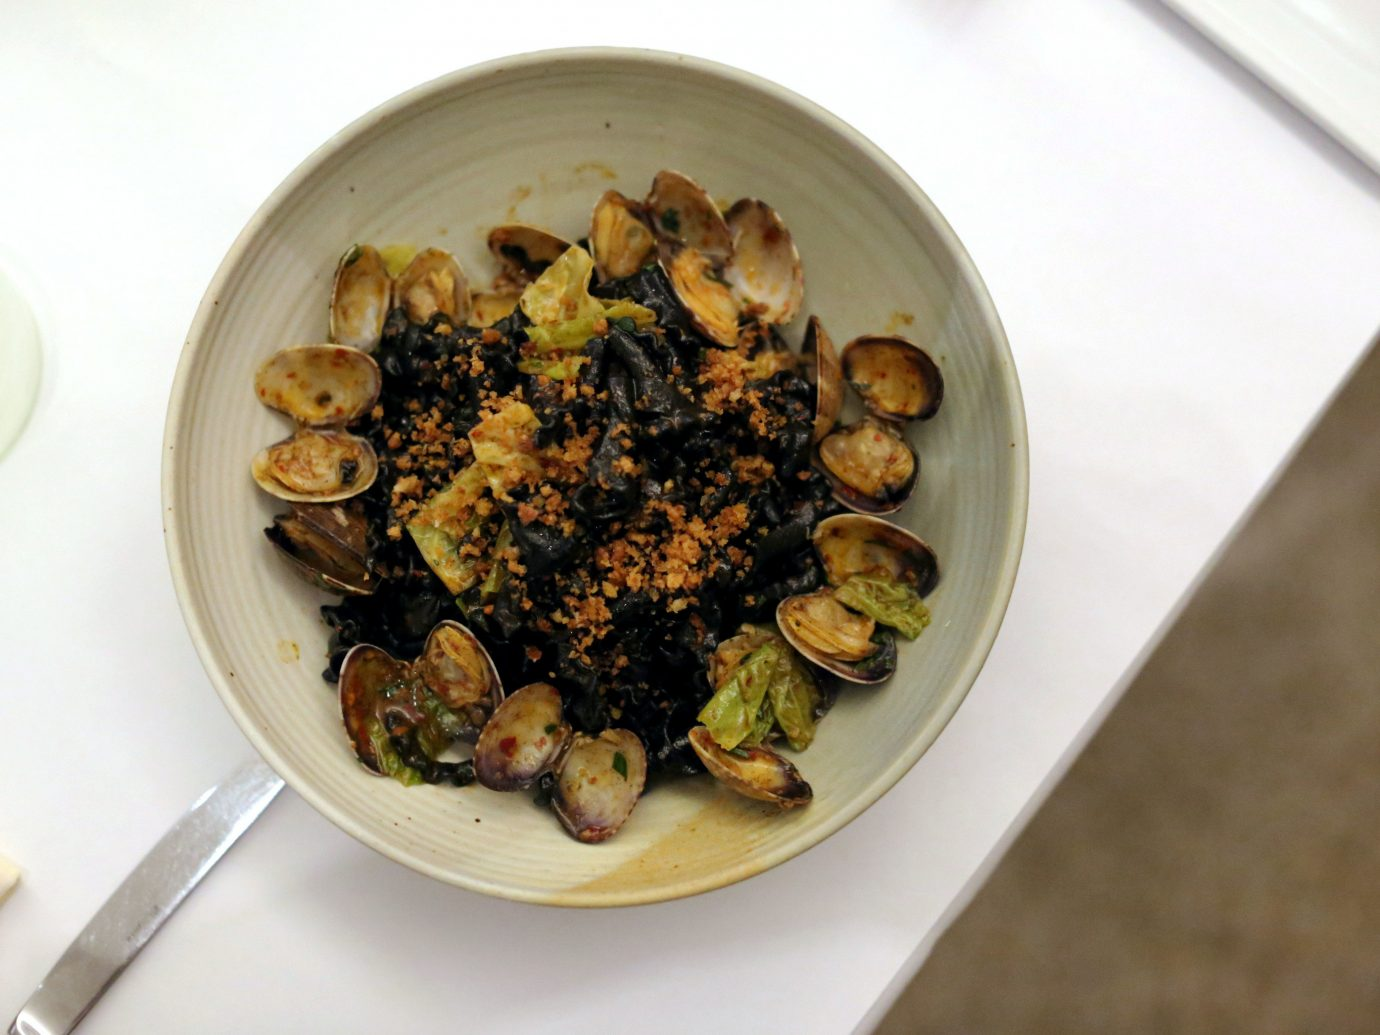 NYC Trip Ideas table food plate dish indoor leaf vegetable vegetarian food vegetable cuisine meal recipe cruciferous vegetables